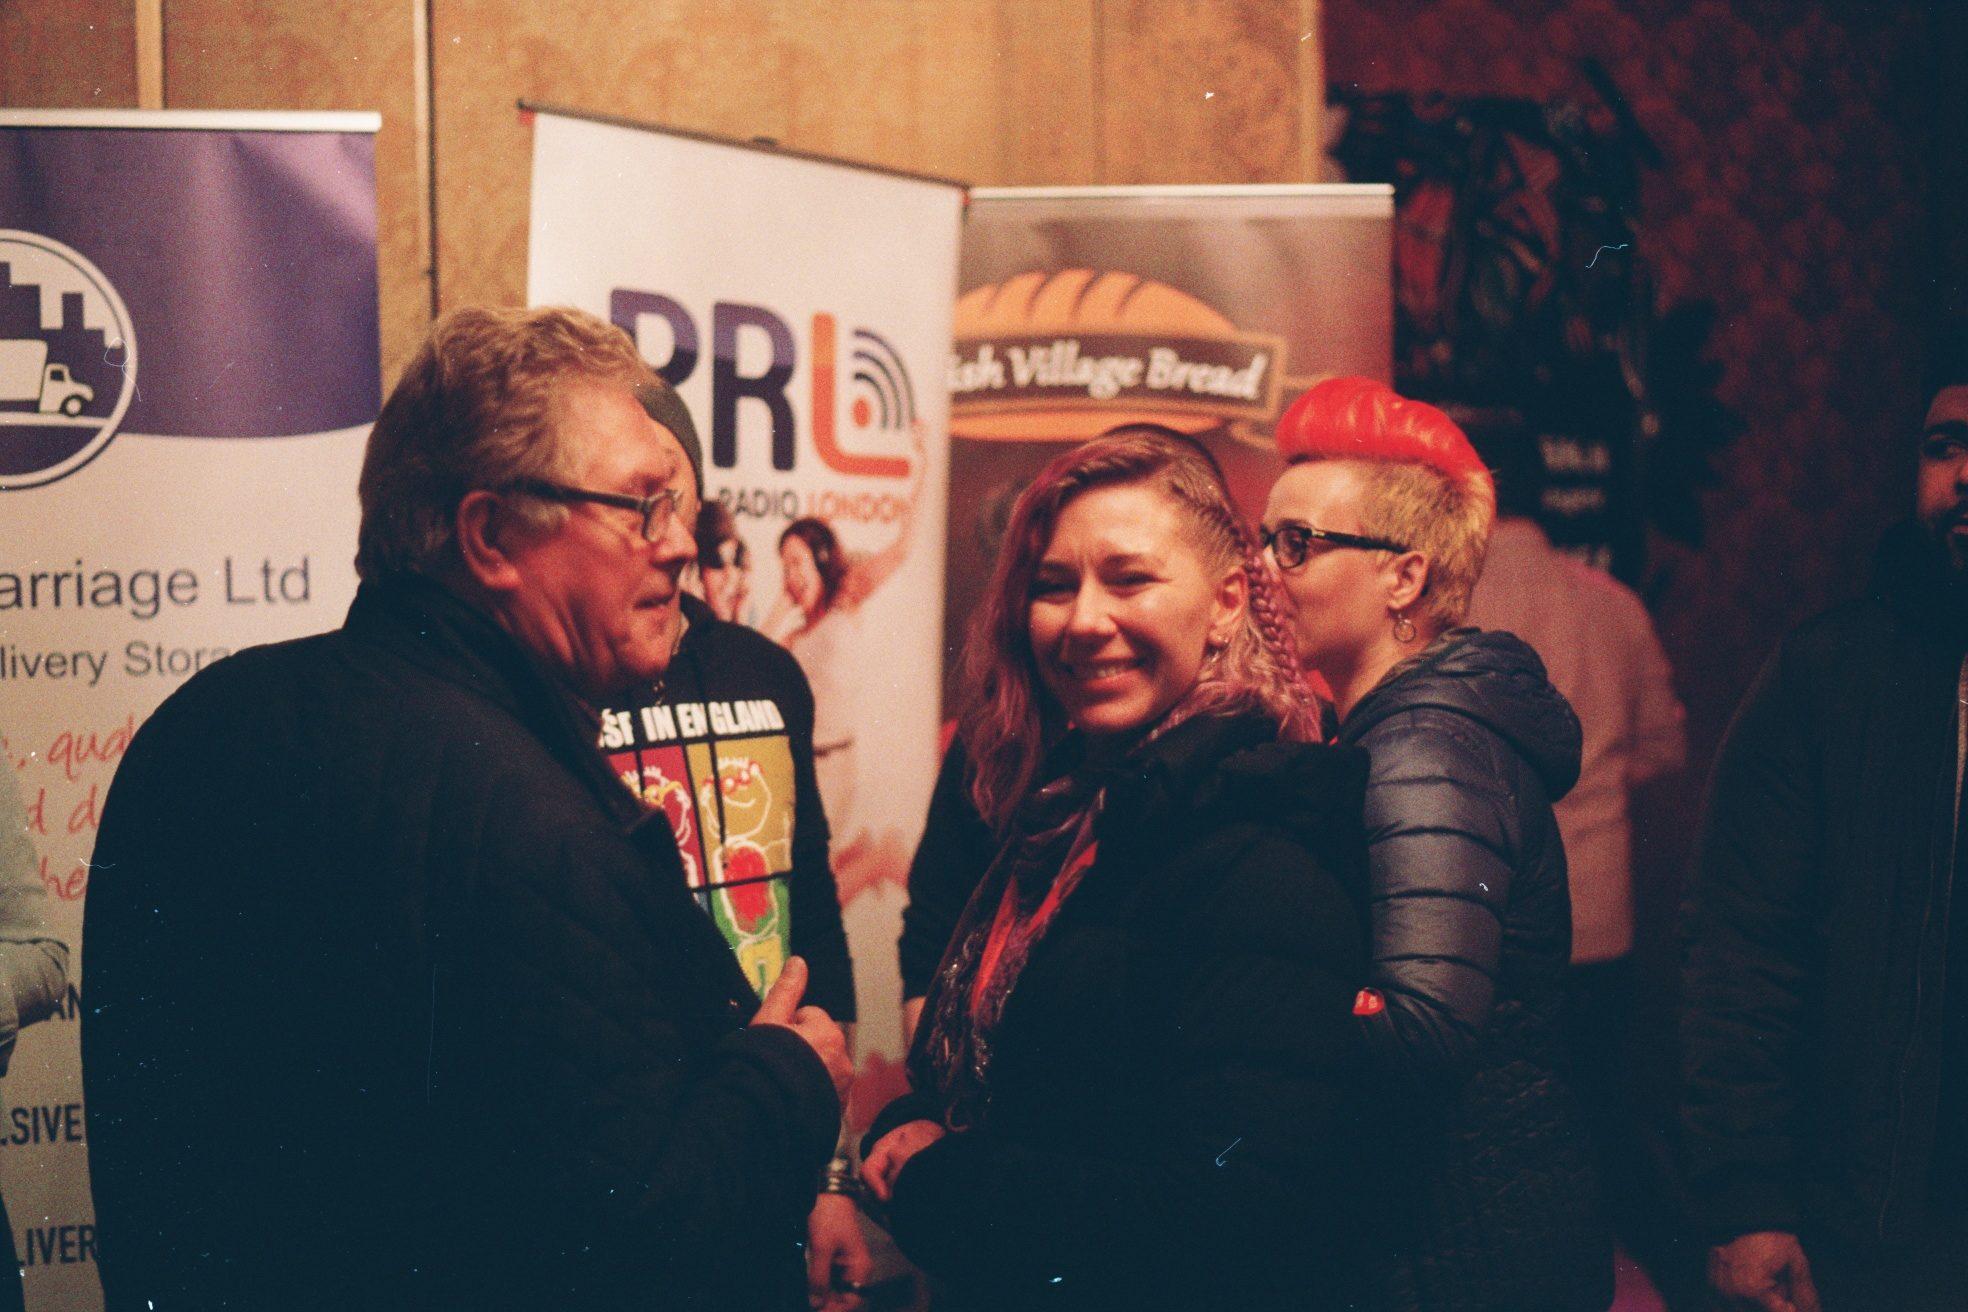 Anna Ciecierska, the lead organizer of the GOCC (WOŚP) final in London, 2018, welcoming guests. Fot. Bartosz Kielak